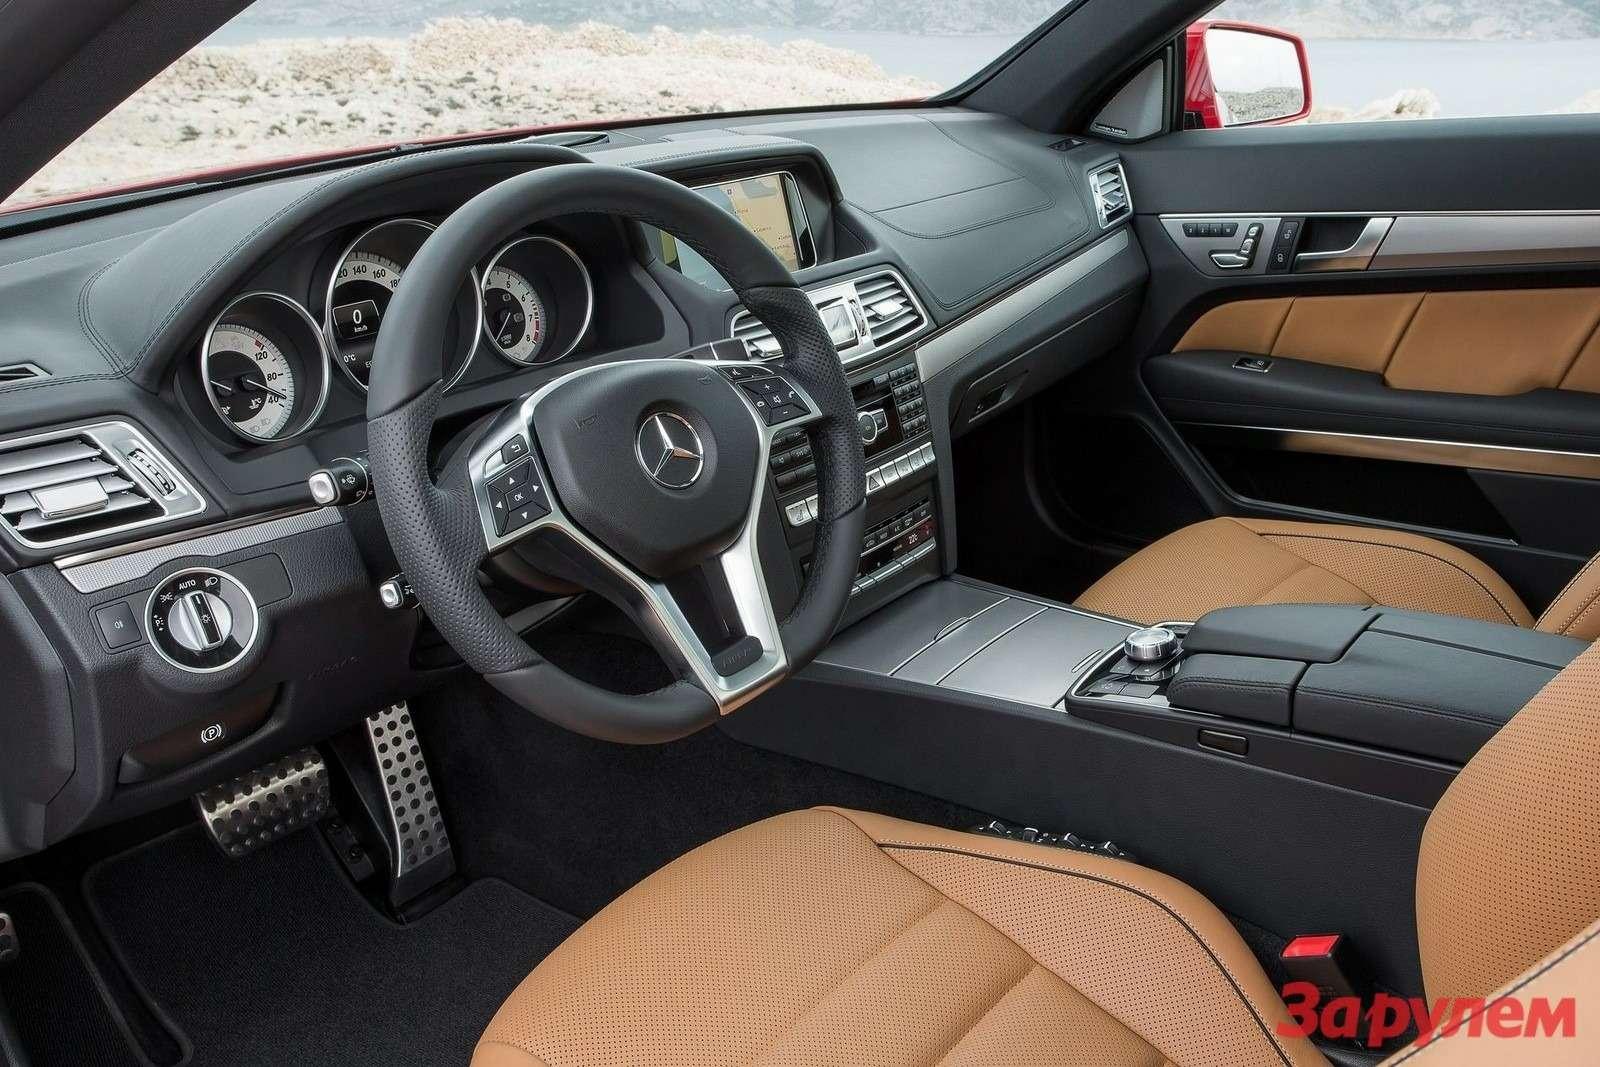 Mercedes-Benz-E-Class_Coupe_2014_1600x1200_wallpaper_16